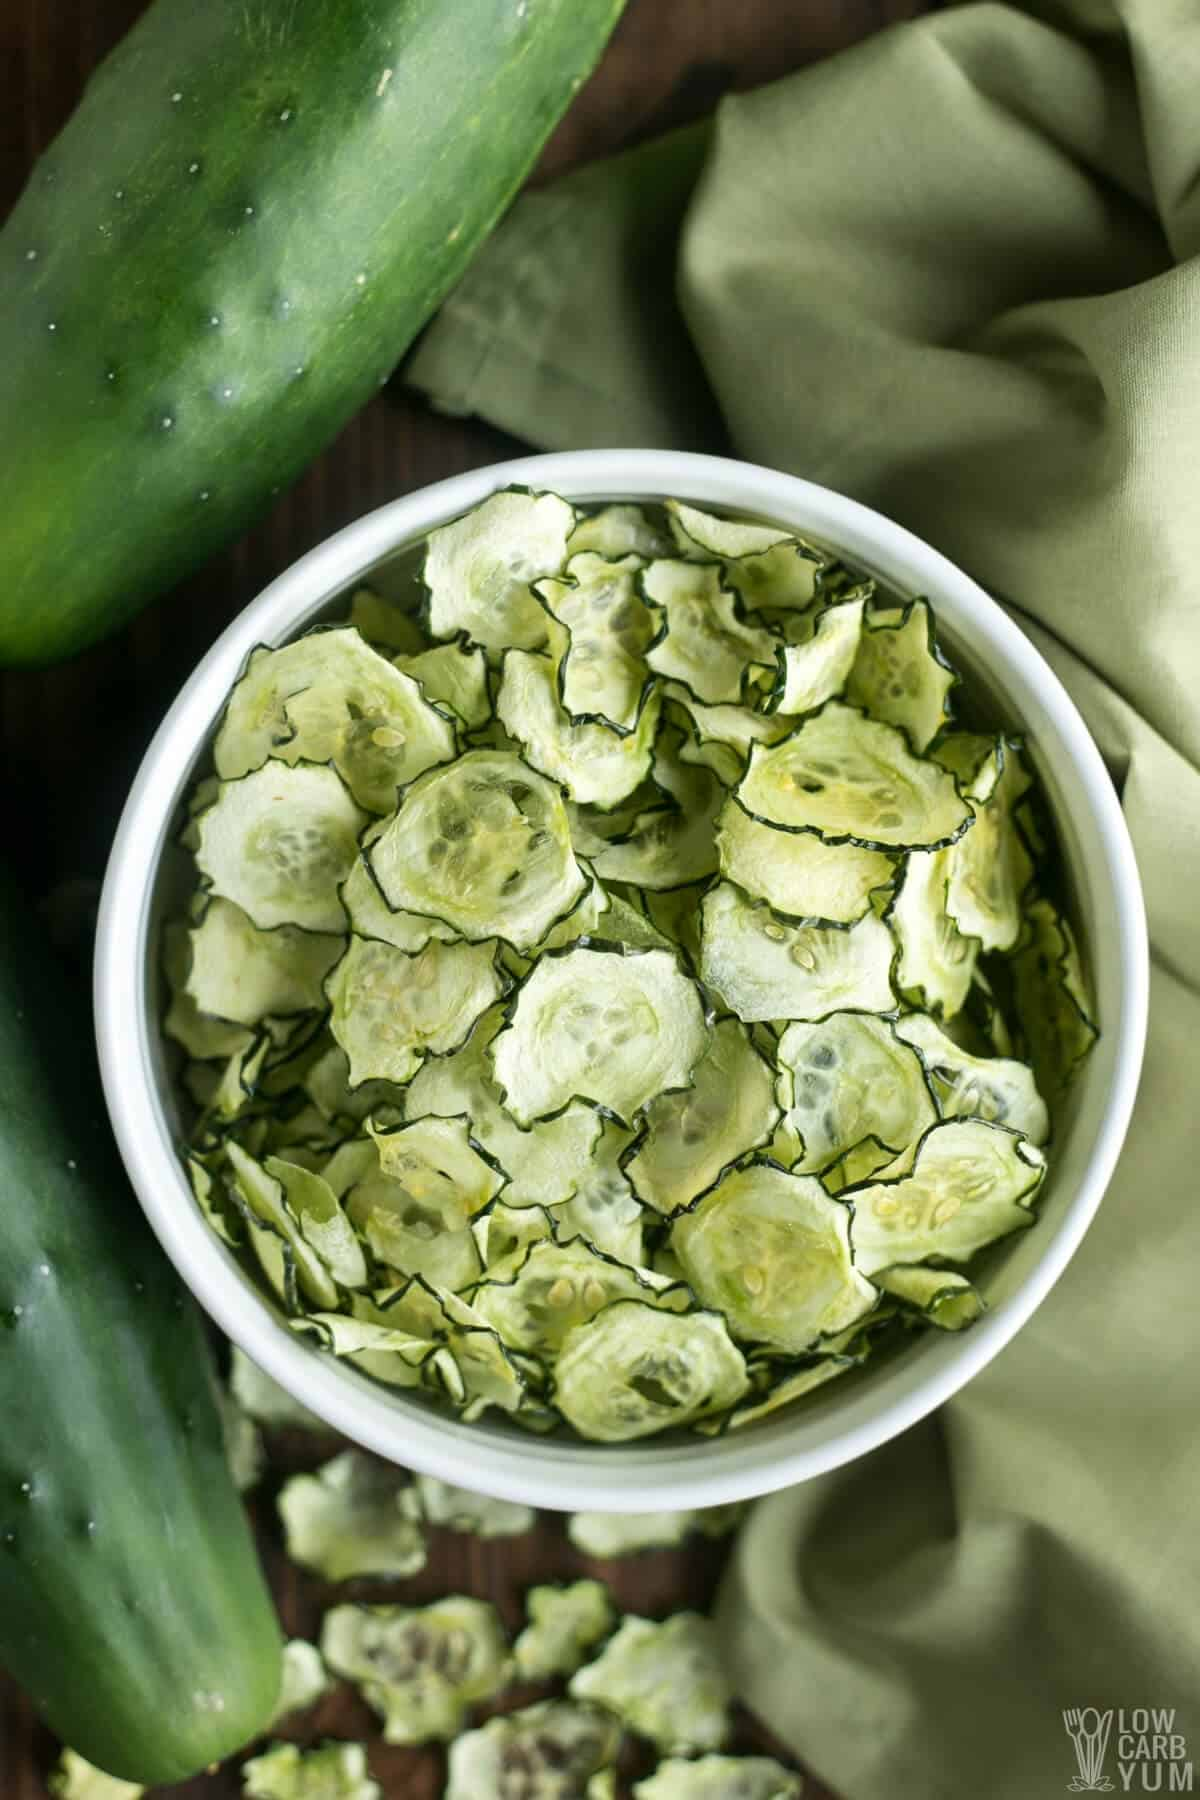 Baked Cucumber Chips with Salt & Vinegar